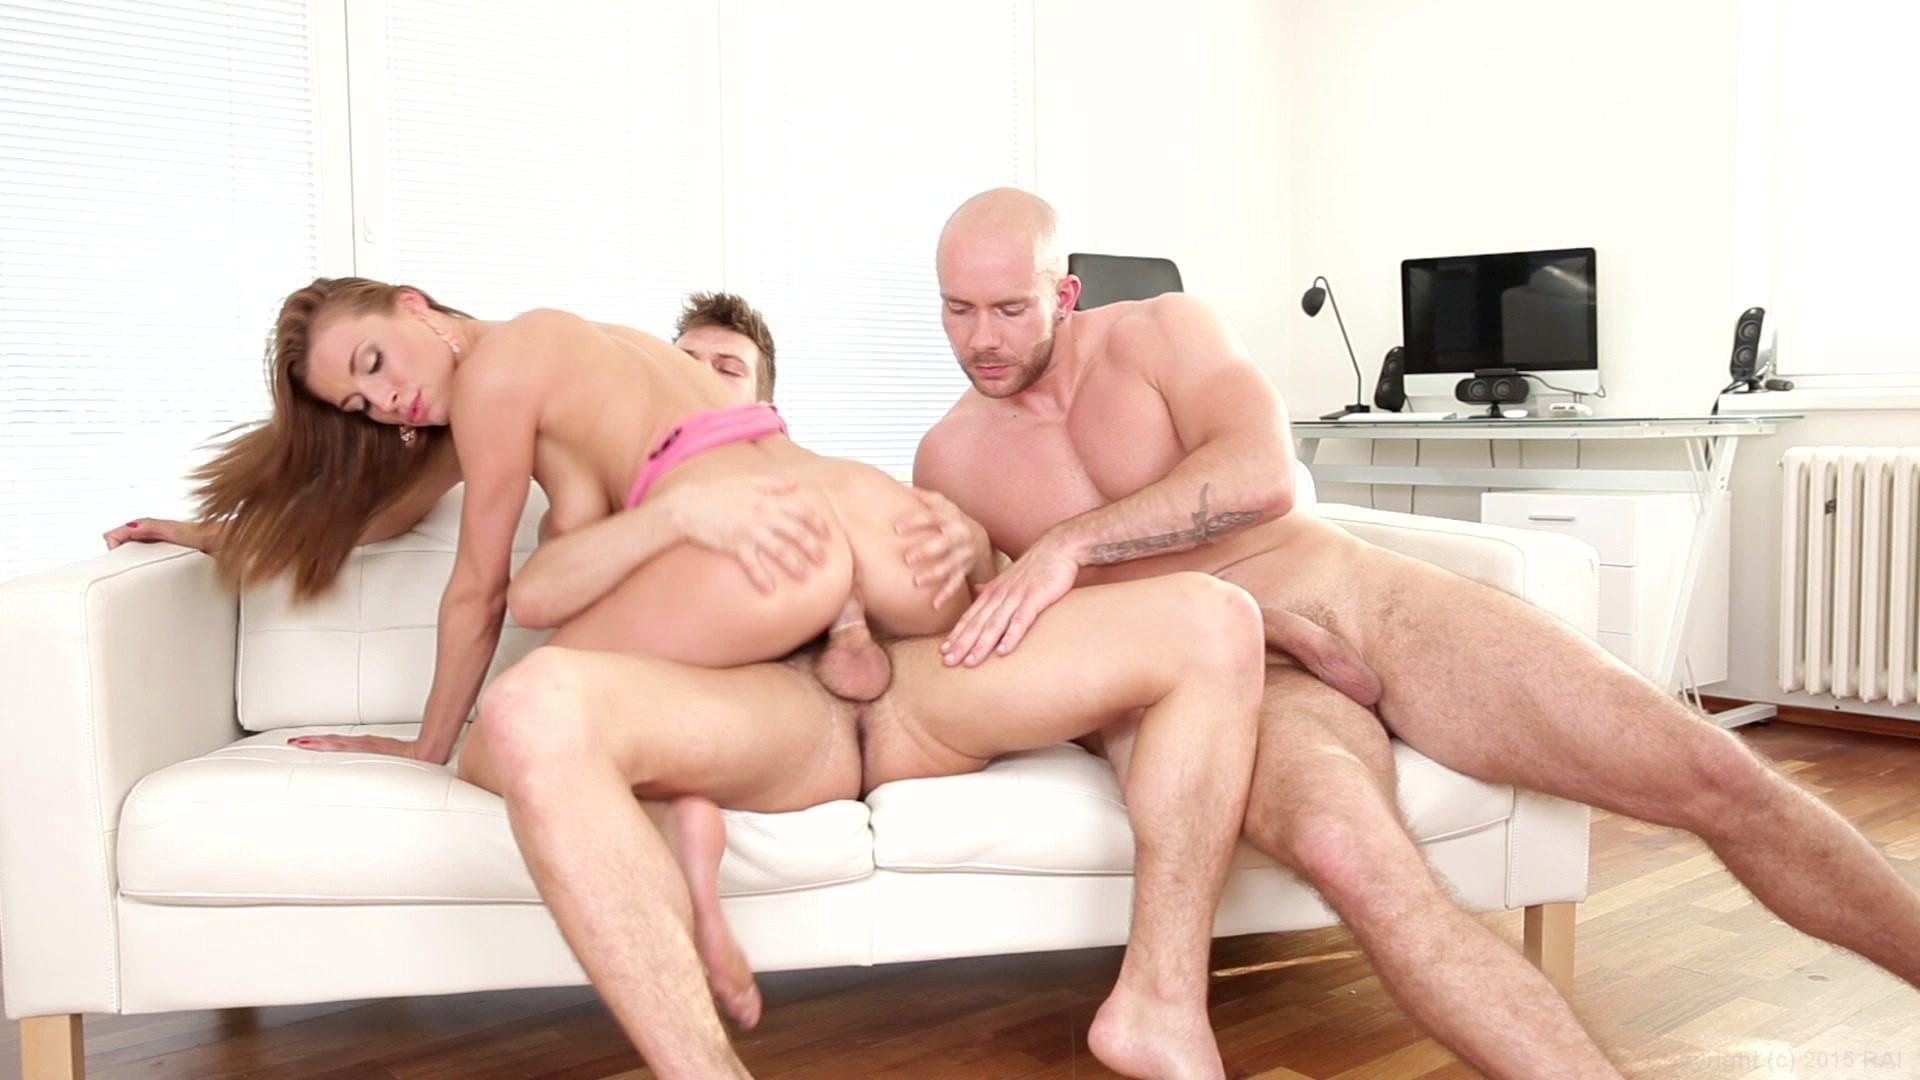 Homemade threesome mmf